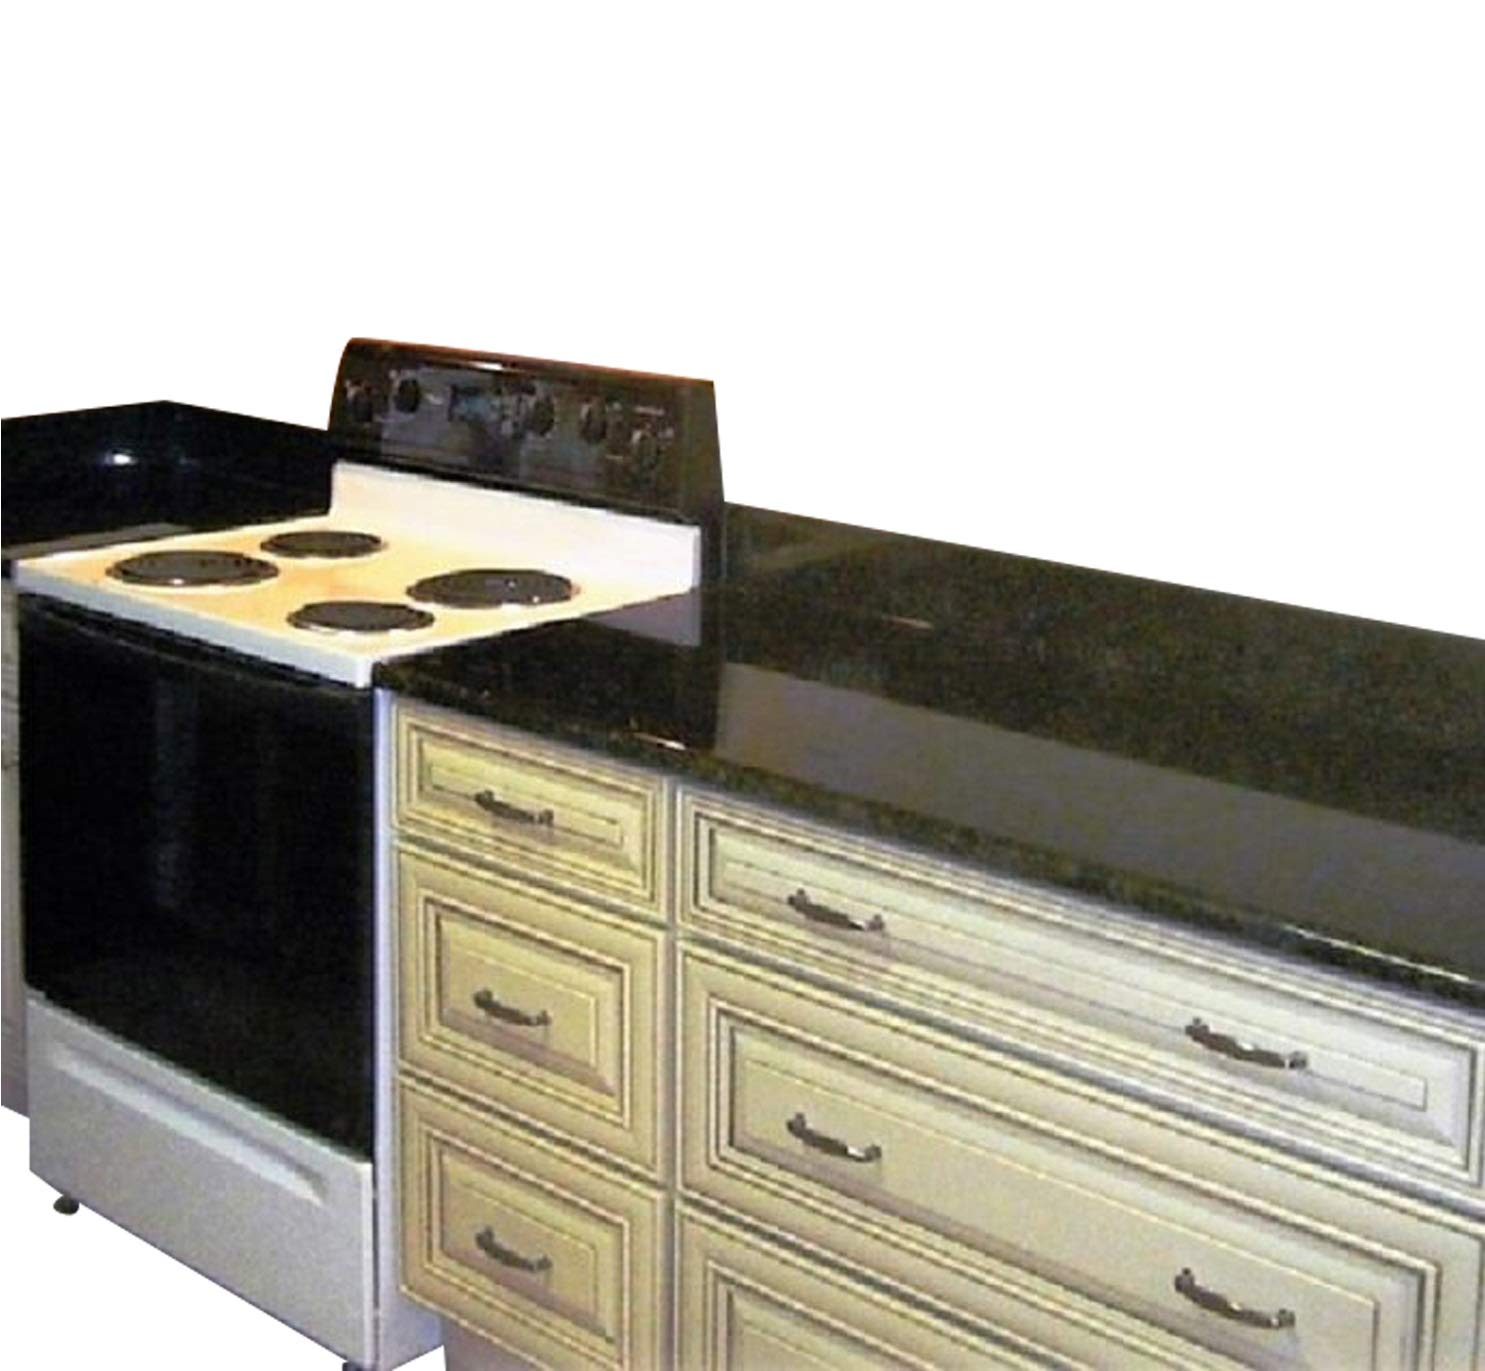 Peel and Stick Black Faux Marble Granite Countertop Film Self Adhesive Vinyl Laminate Counter Top Contact Paper 36'' x 240''